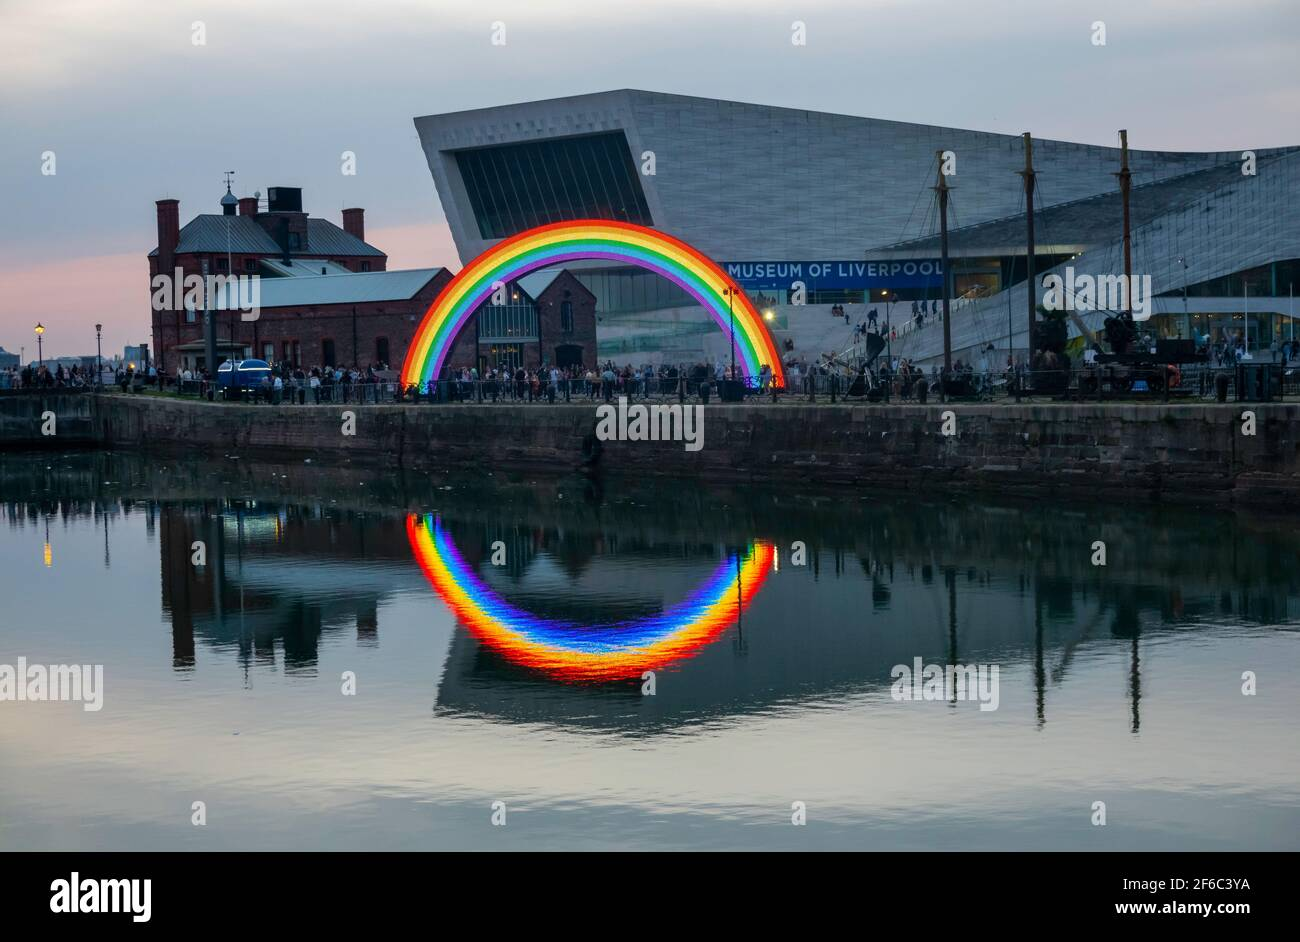 rainbow-street-art-exhibit-part-of-river